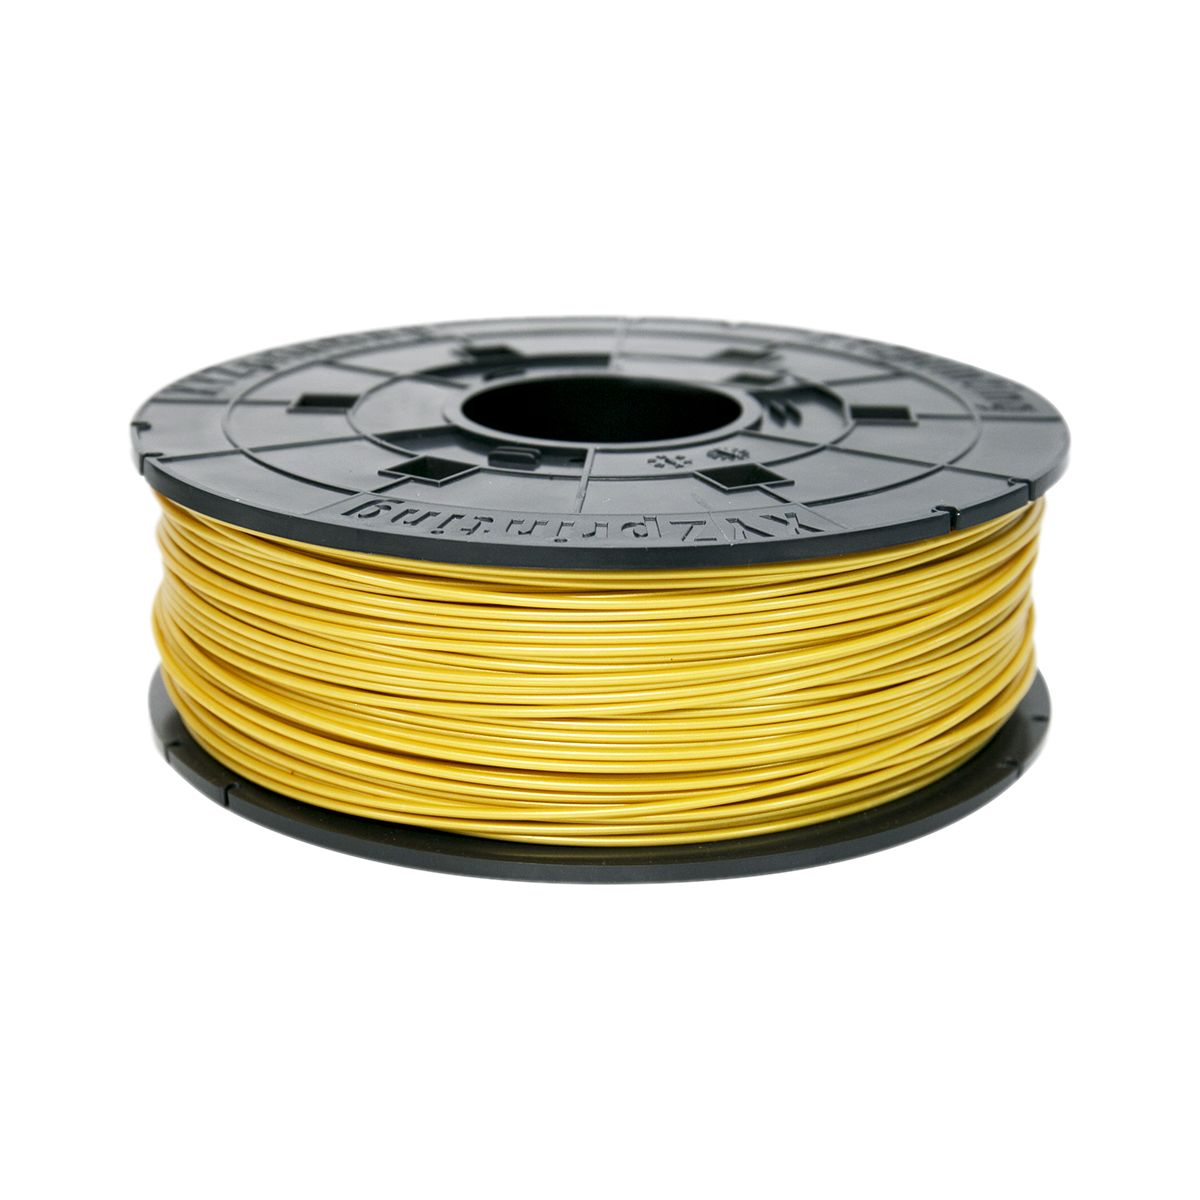 Filament 3d xyz printing filament abs gold - 2% de remise imm?...